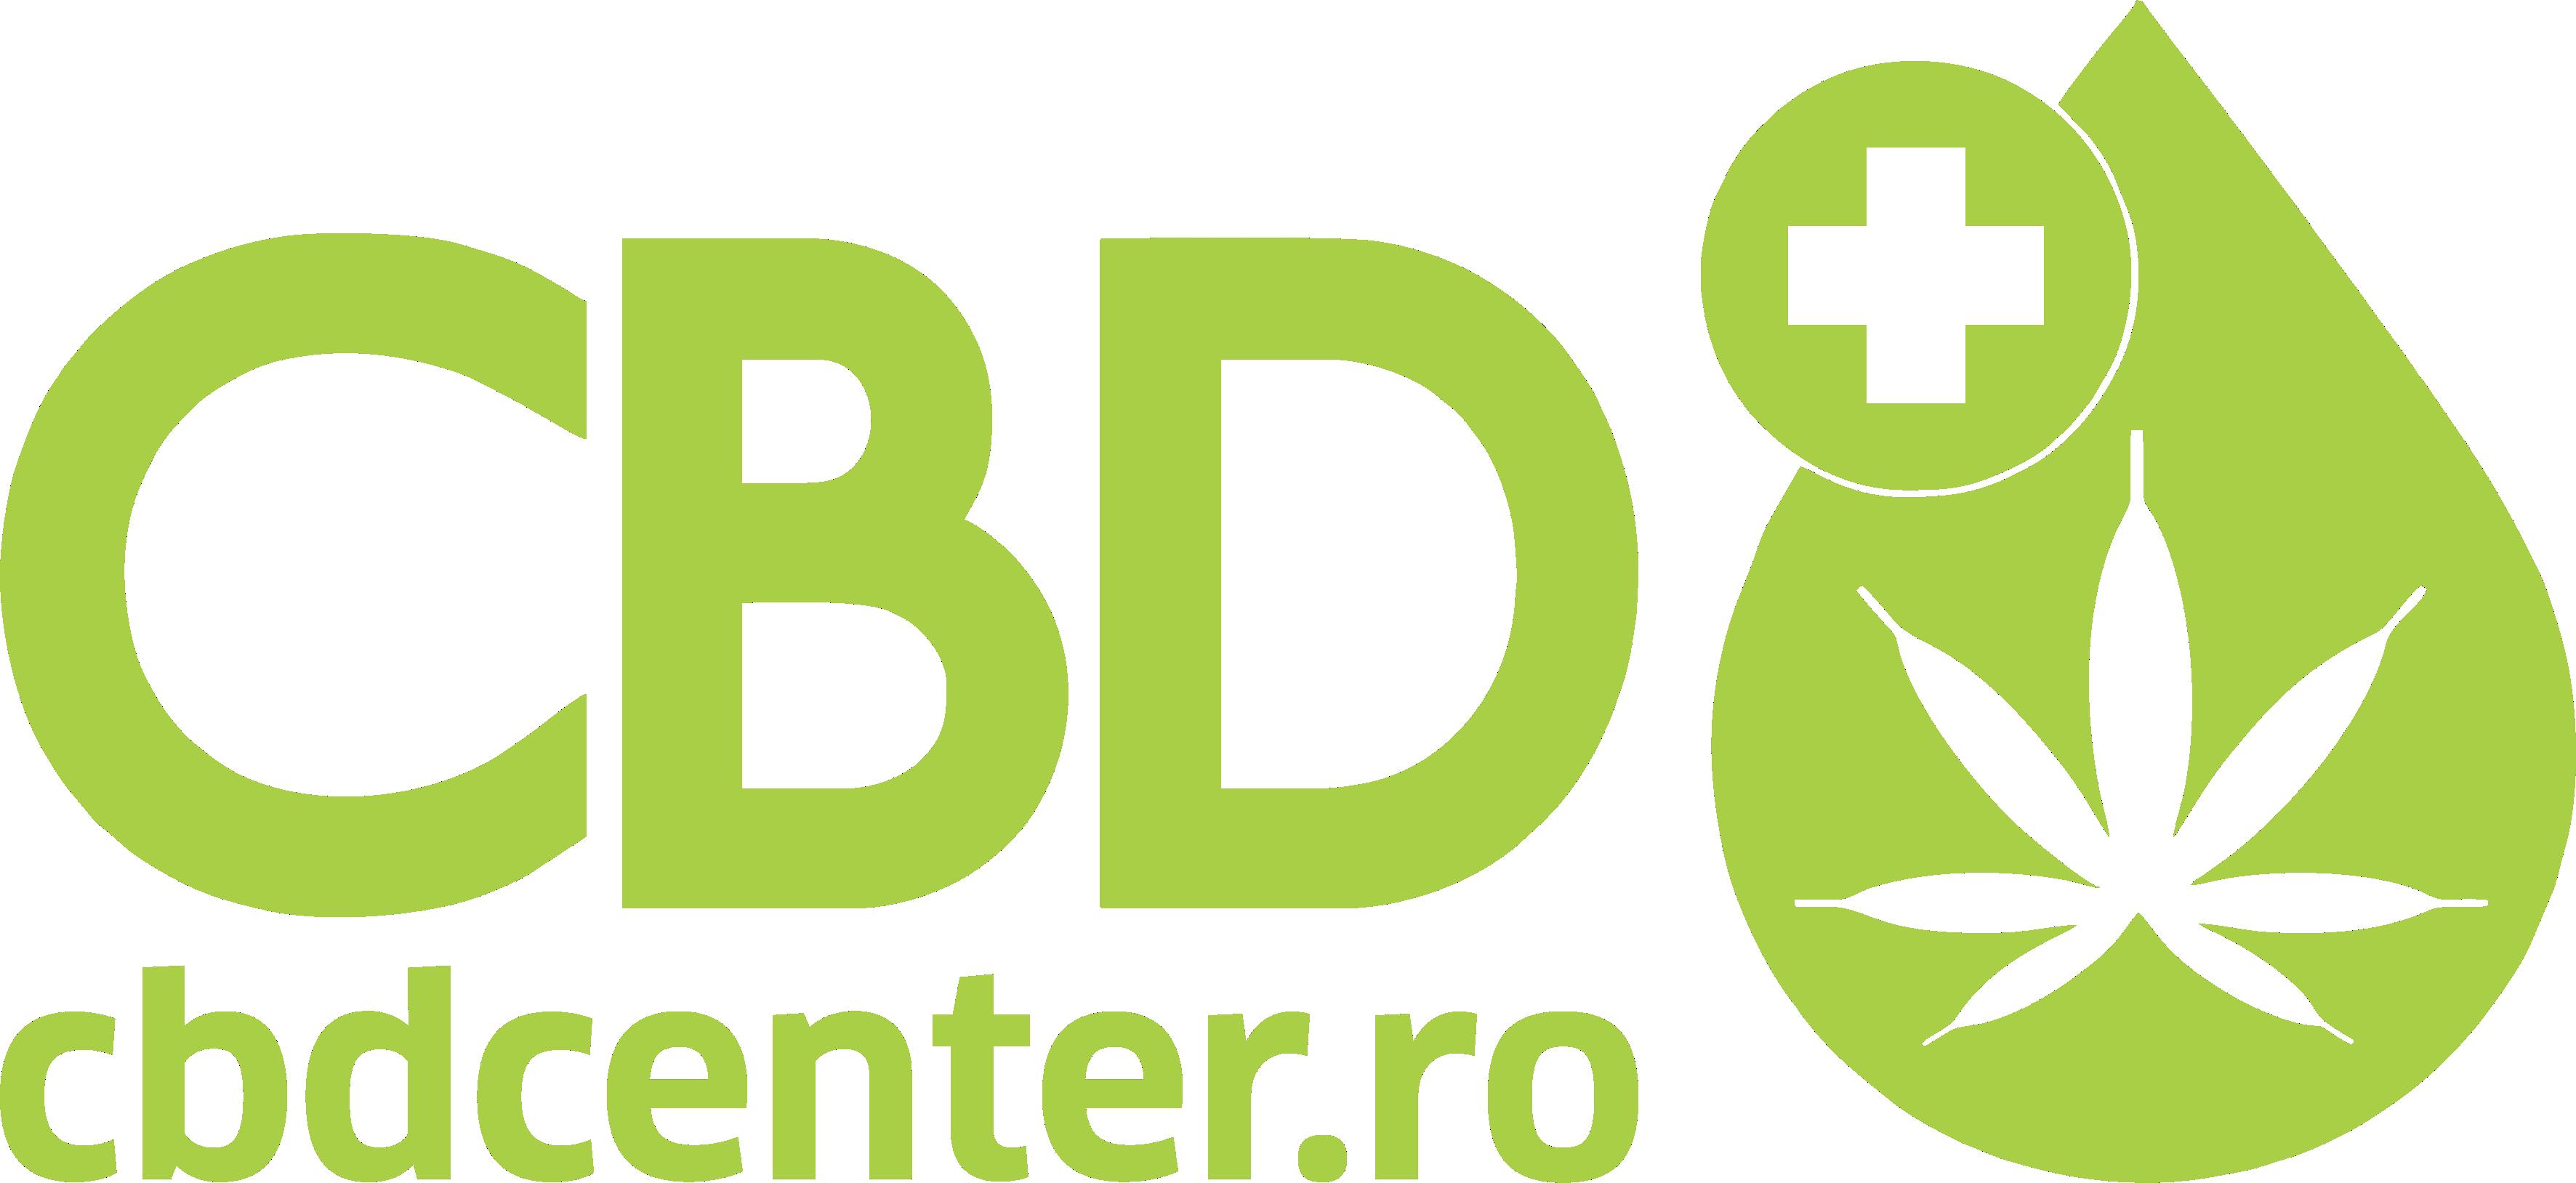 CBD Center by CATROM CBD ENTERPRISE SRL